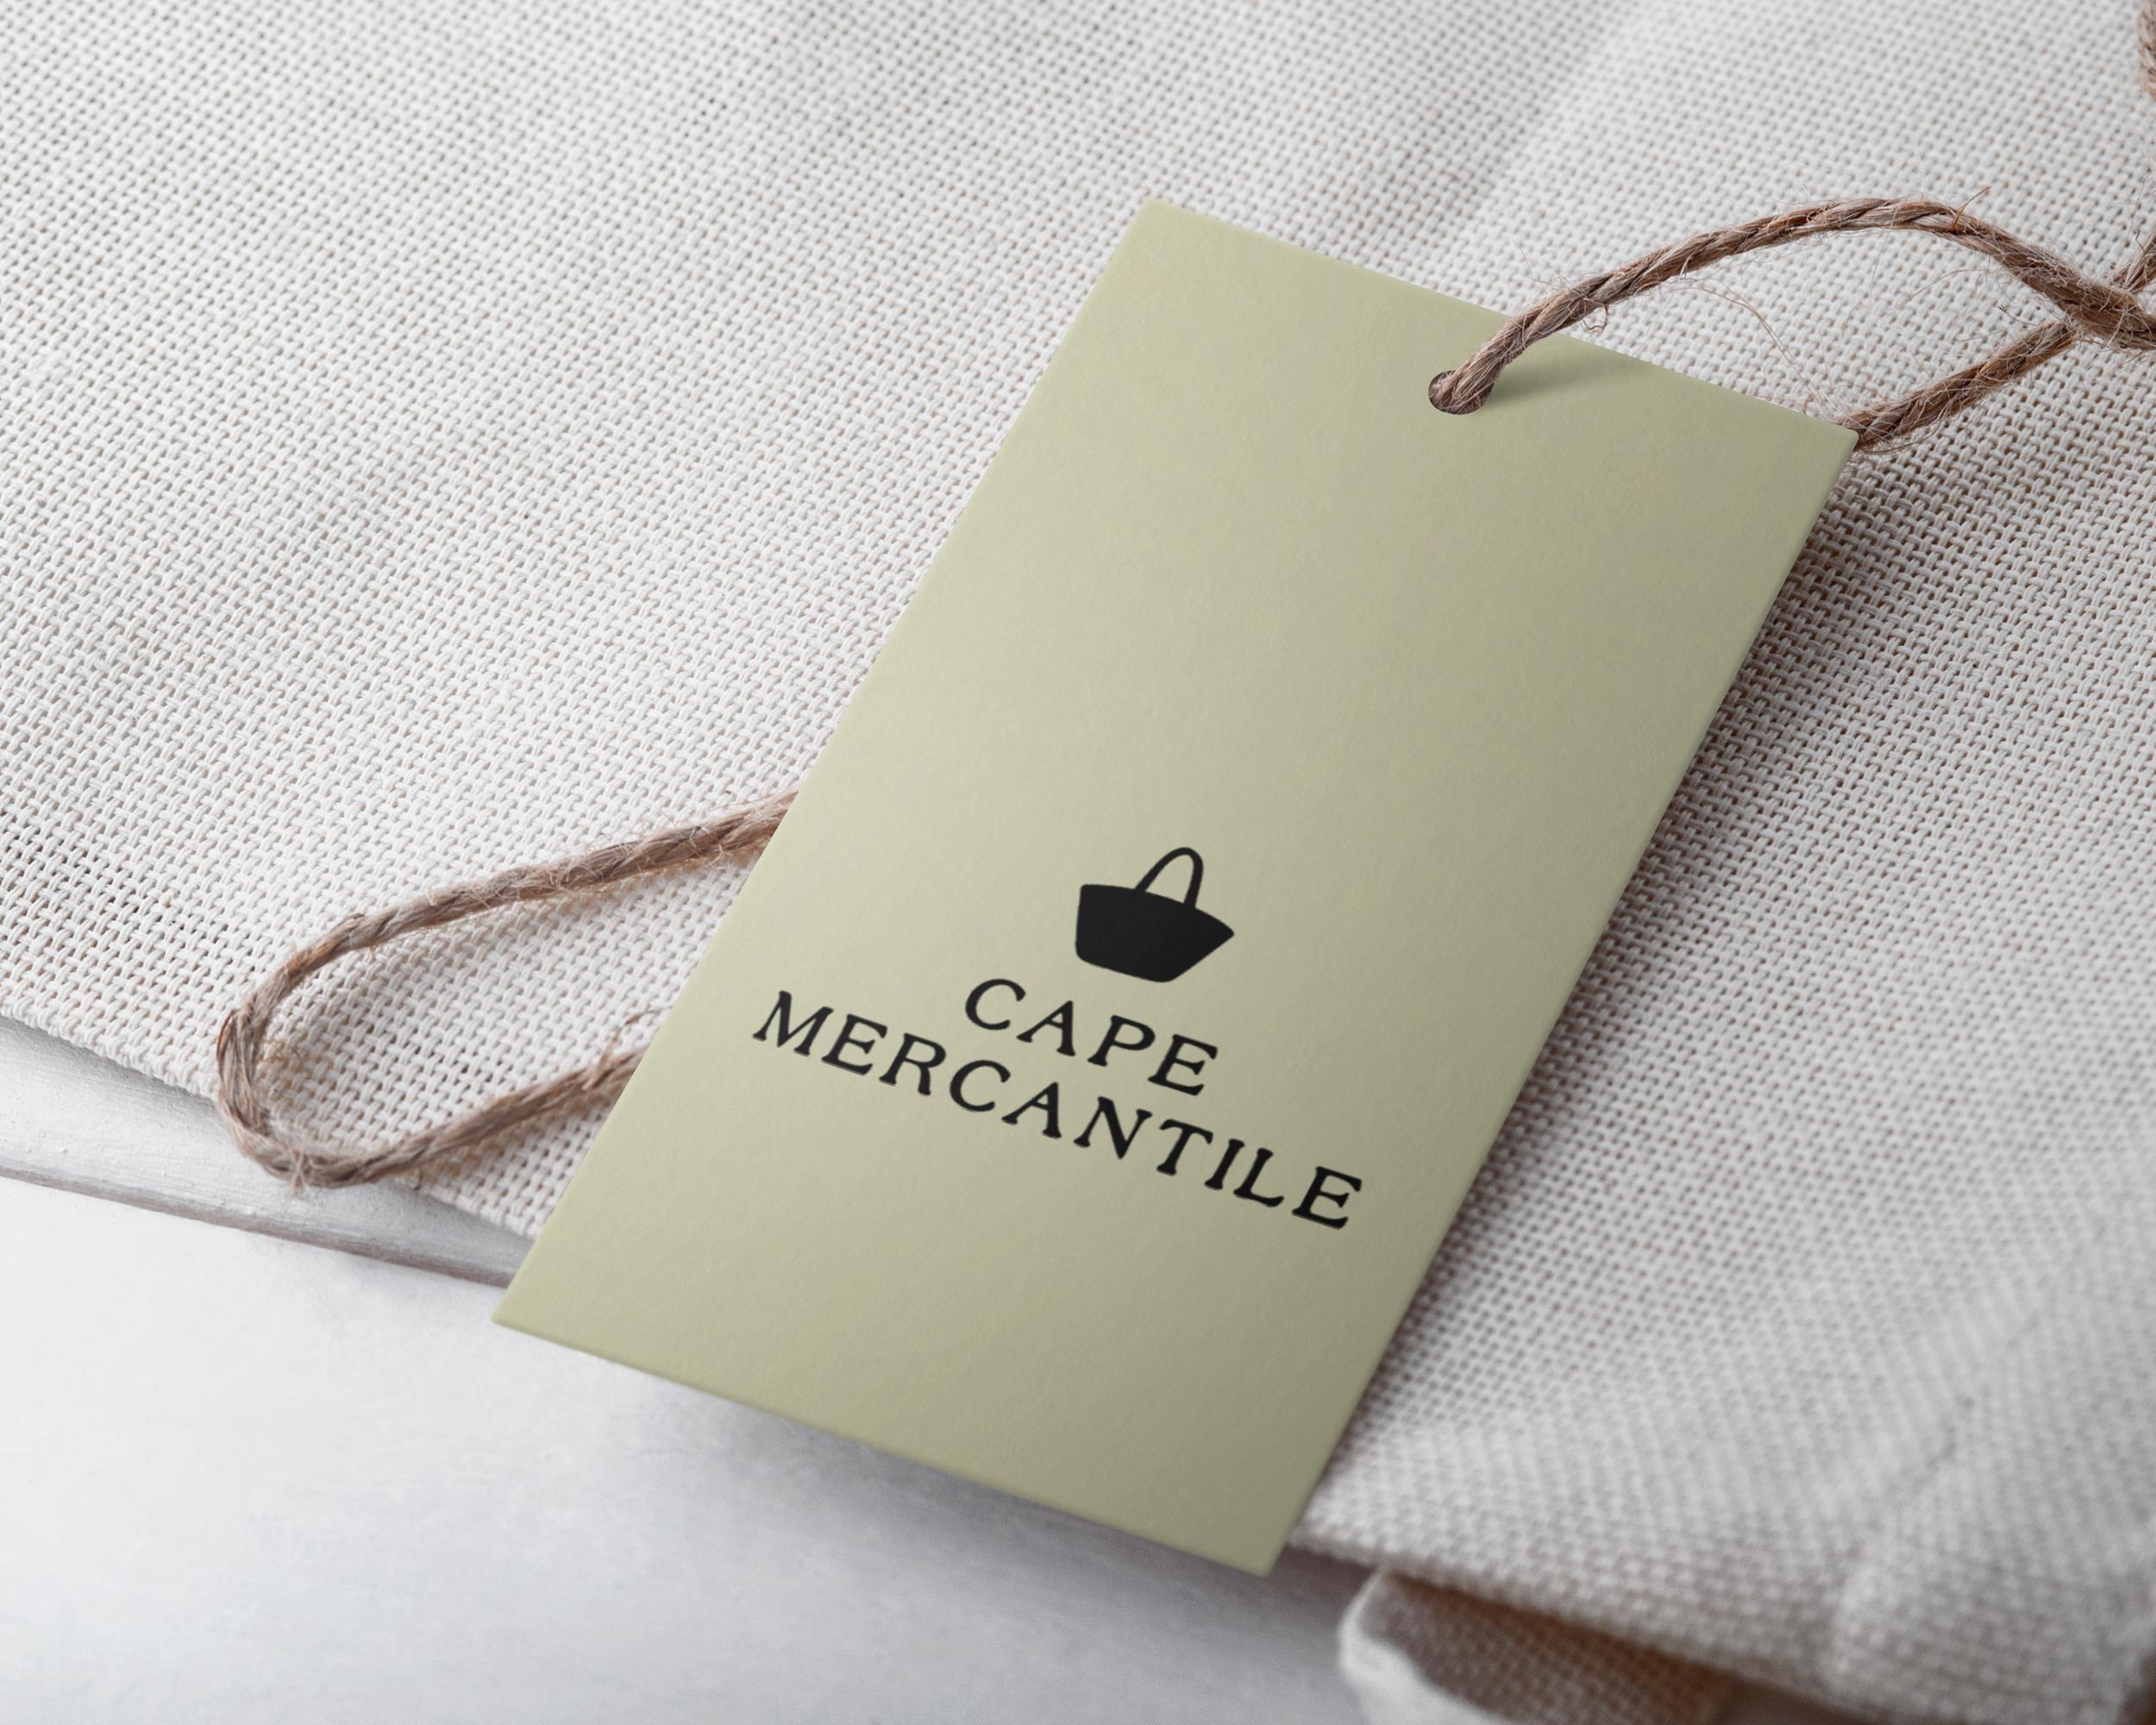 Mercantile_VerticalLabelTag.png